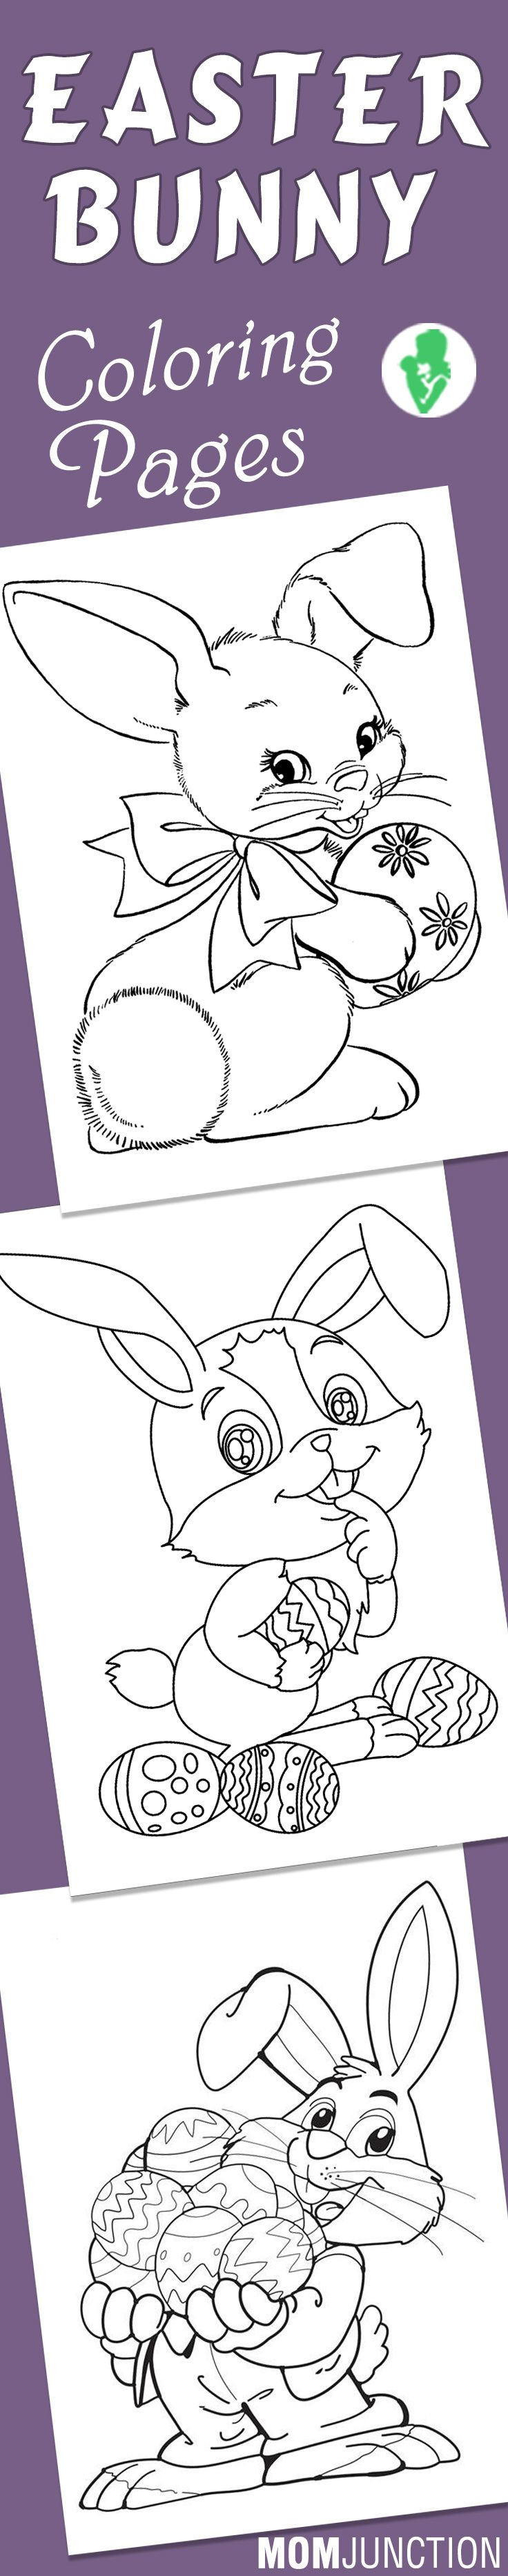 25+ Unique Bunny Coloring Pages Ideas On Pinterest